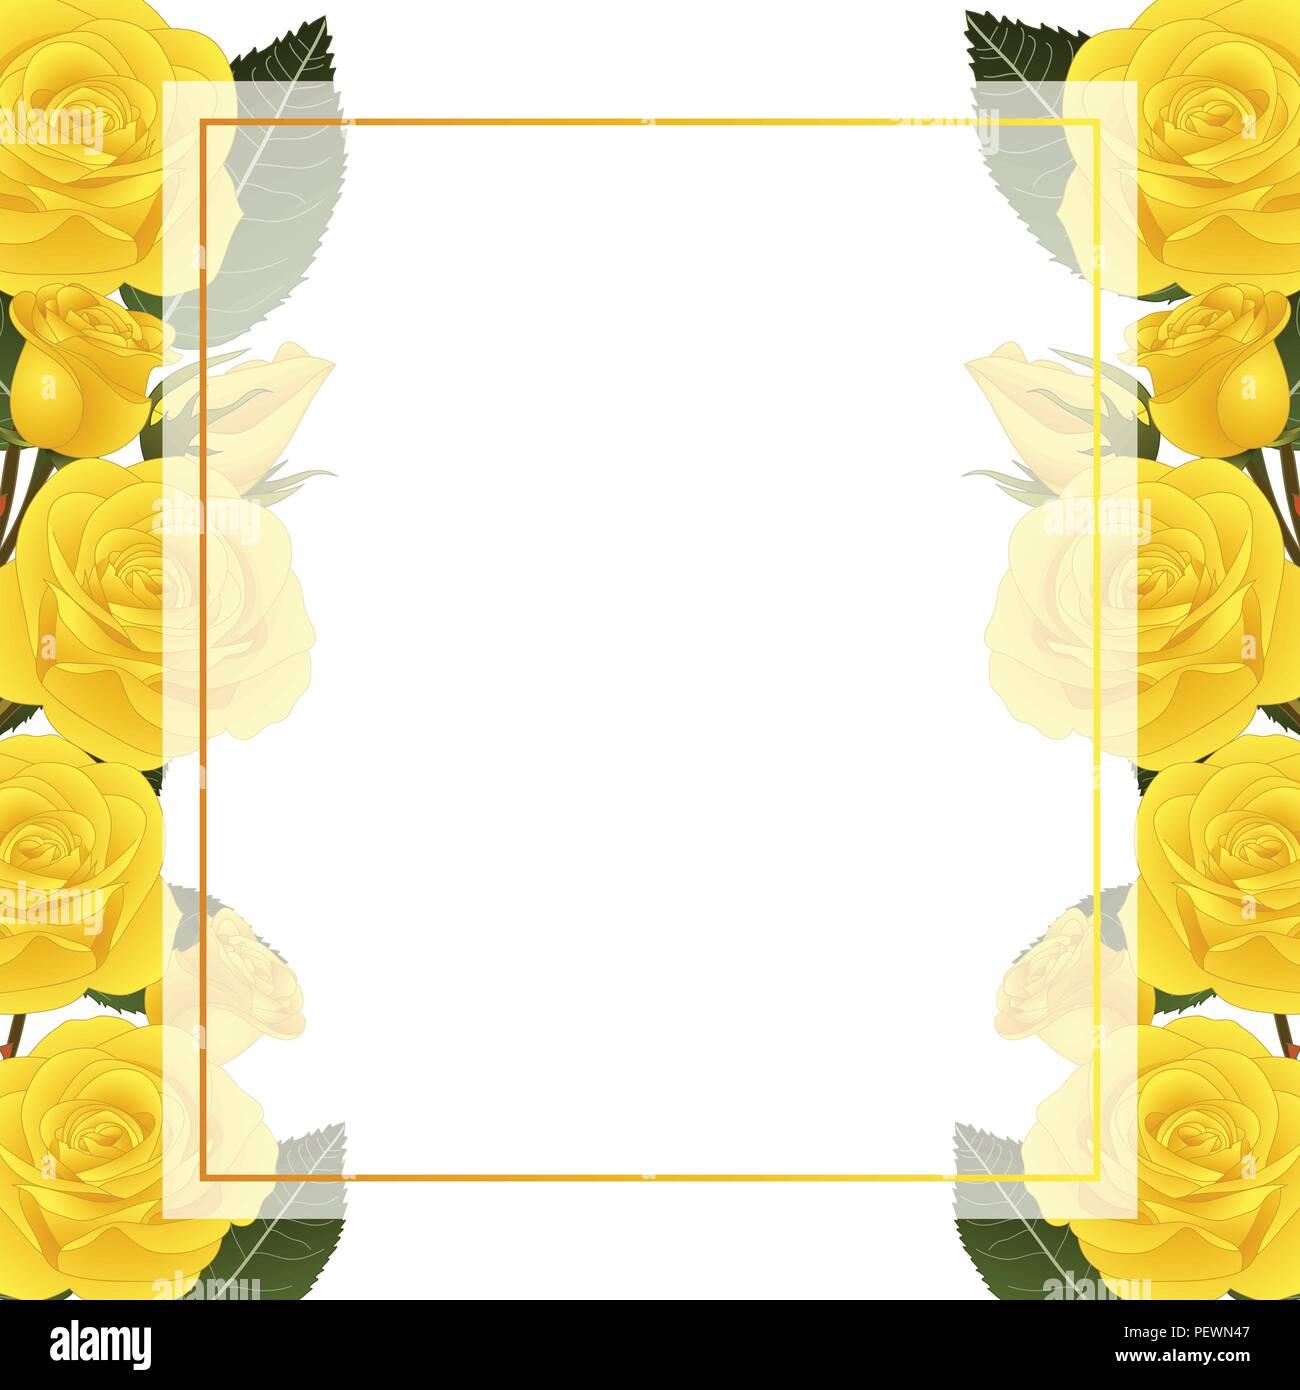 Yellow Rose Flower Frame Banner Card Border Isolated On White